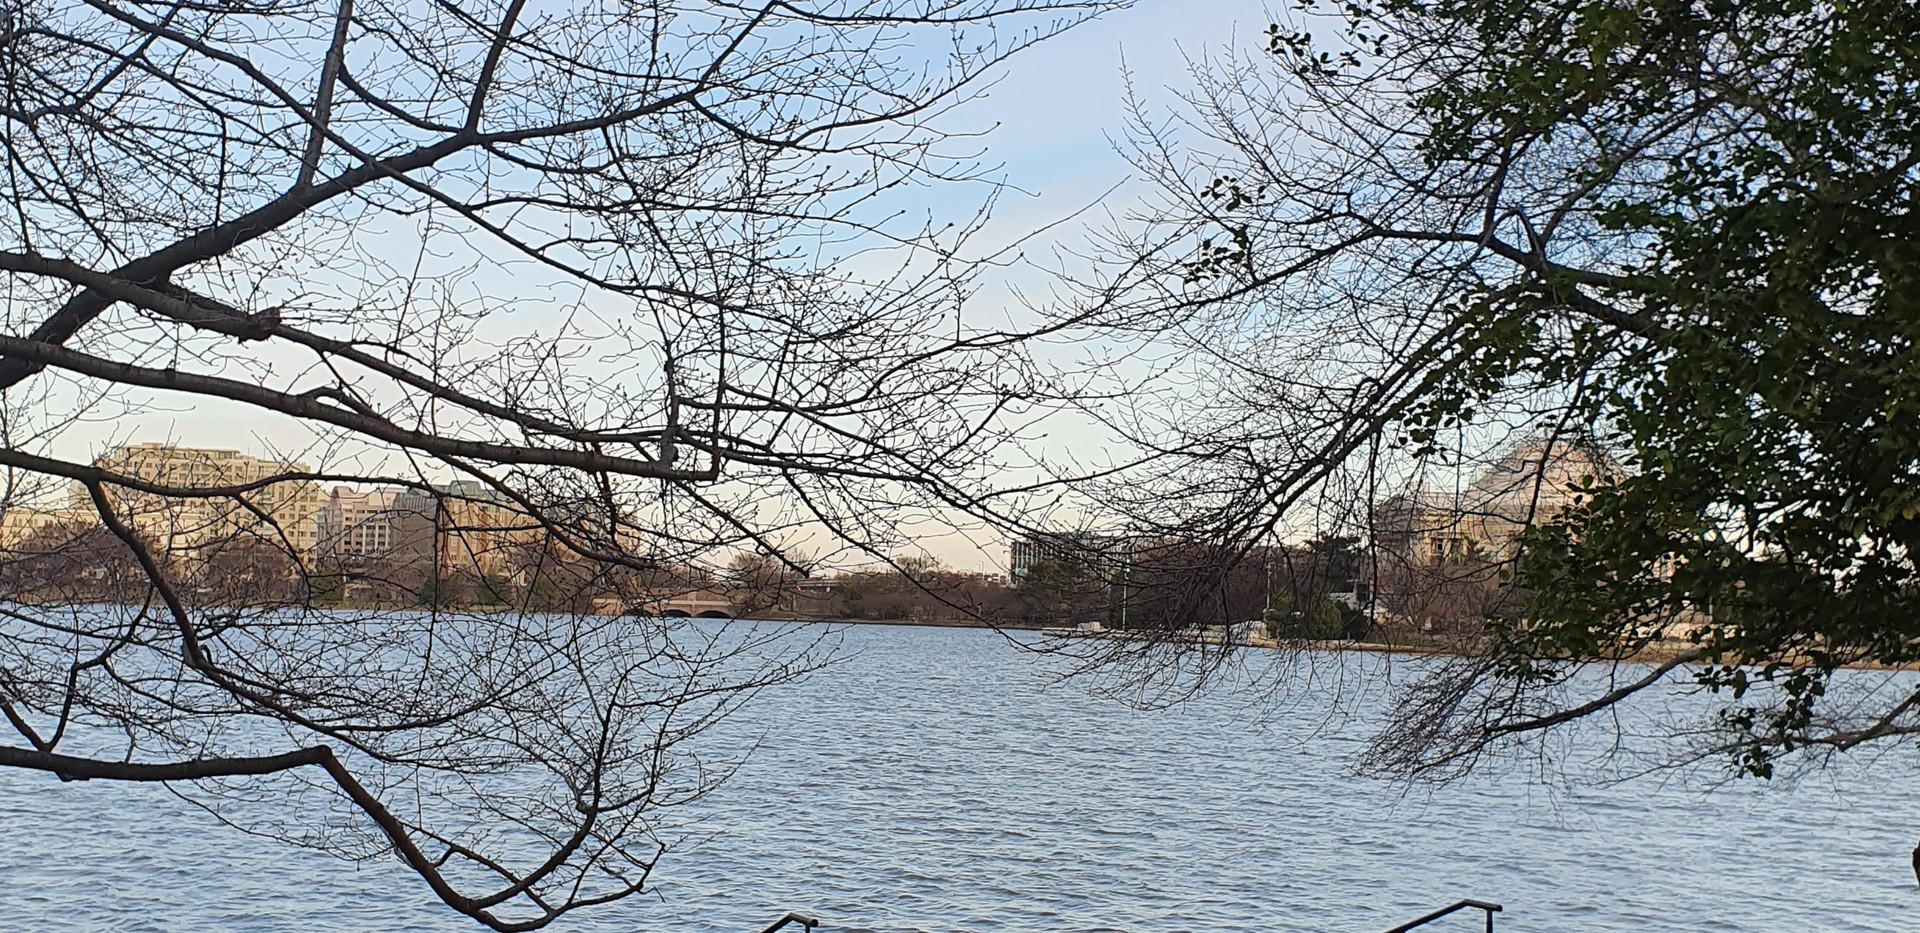 Franklin Delano Roosevelt Memorial - Tidal Basin